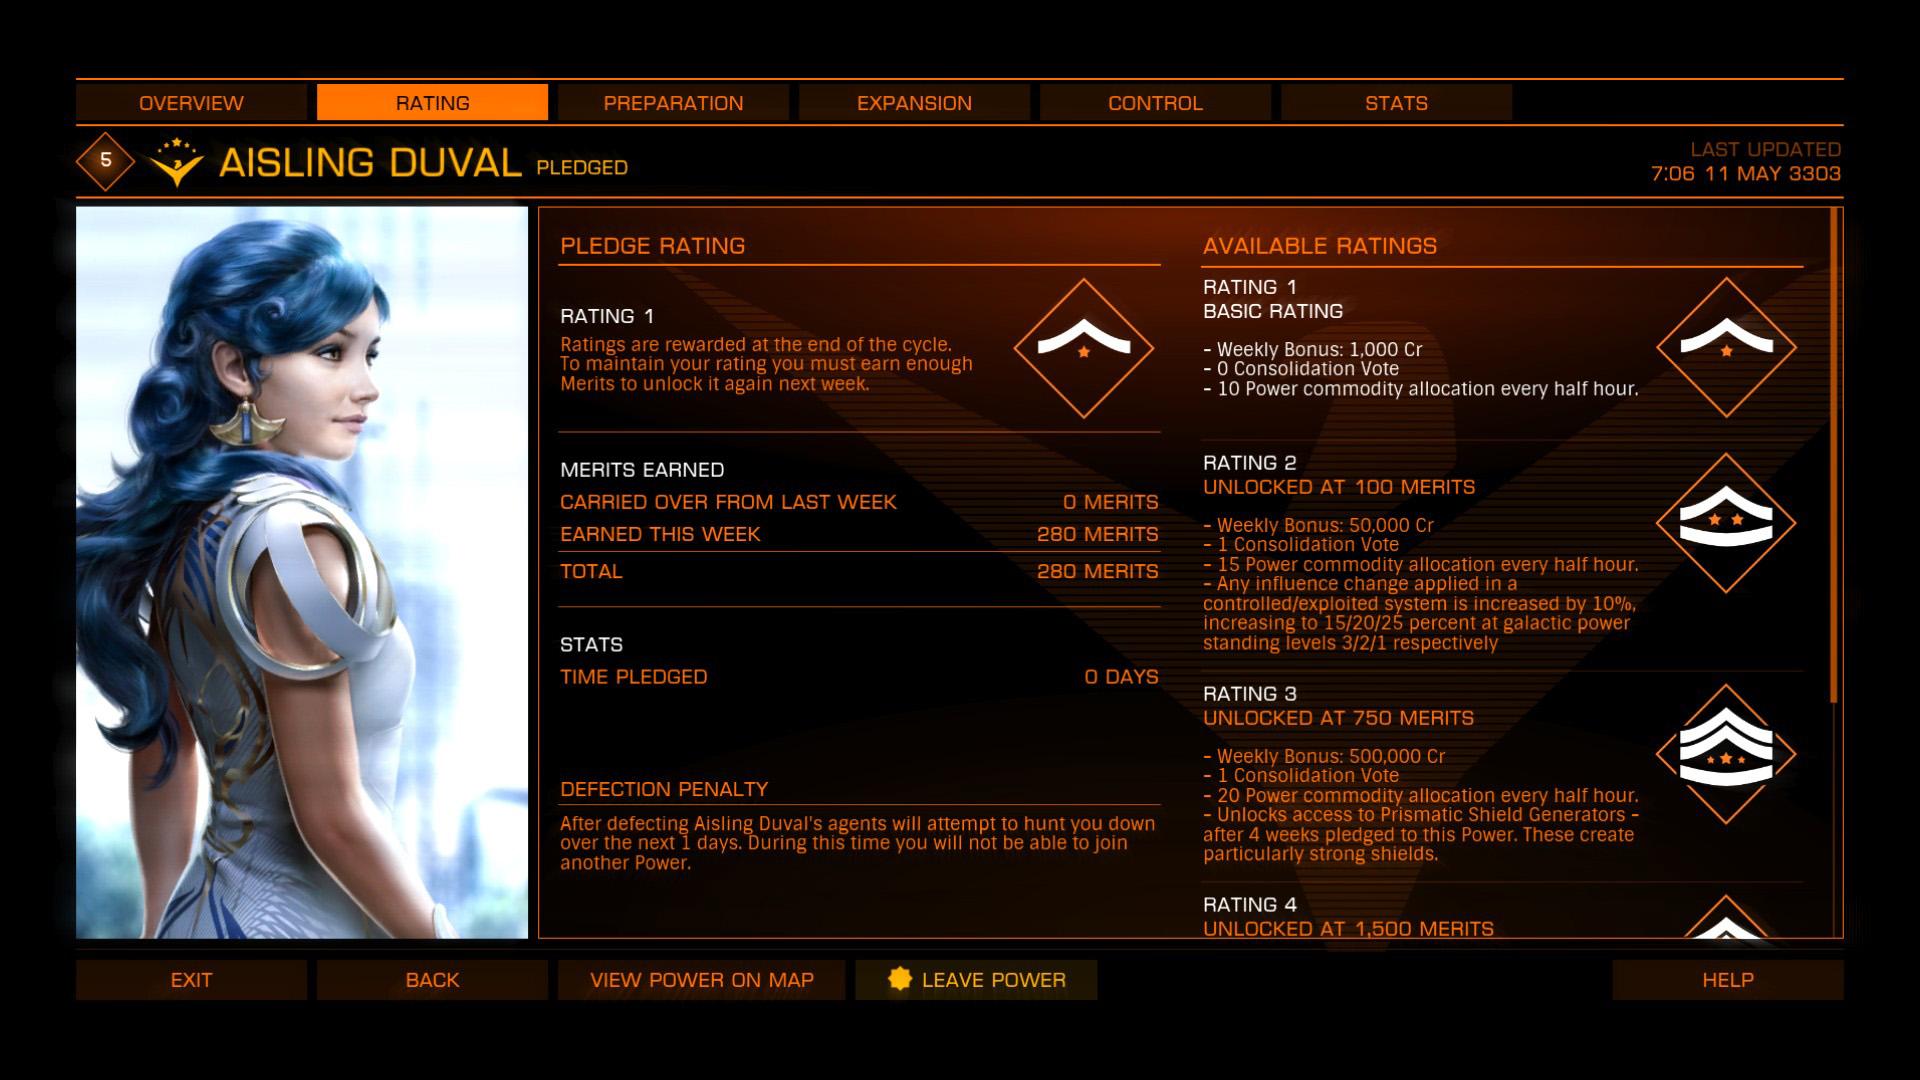 Elite: Dangerous beginner's guide: a screenshot showing a faction-specific powerplay rewards